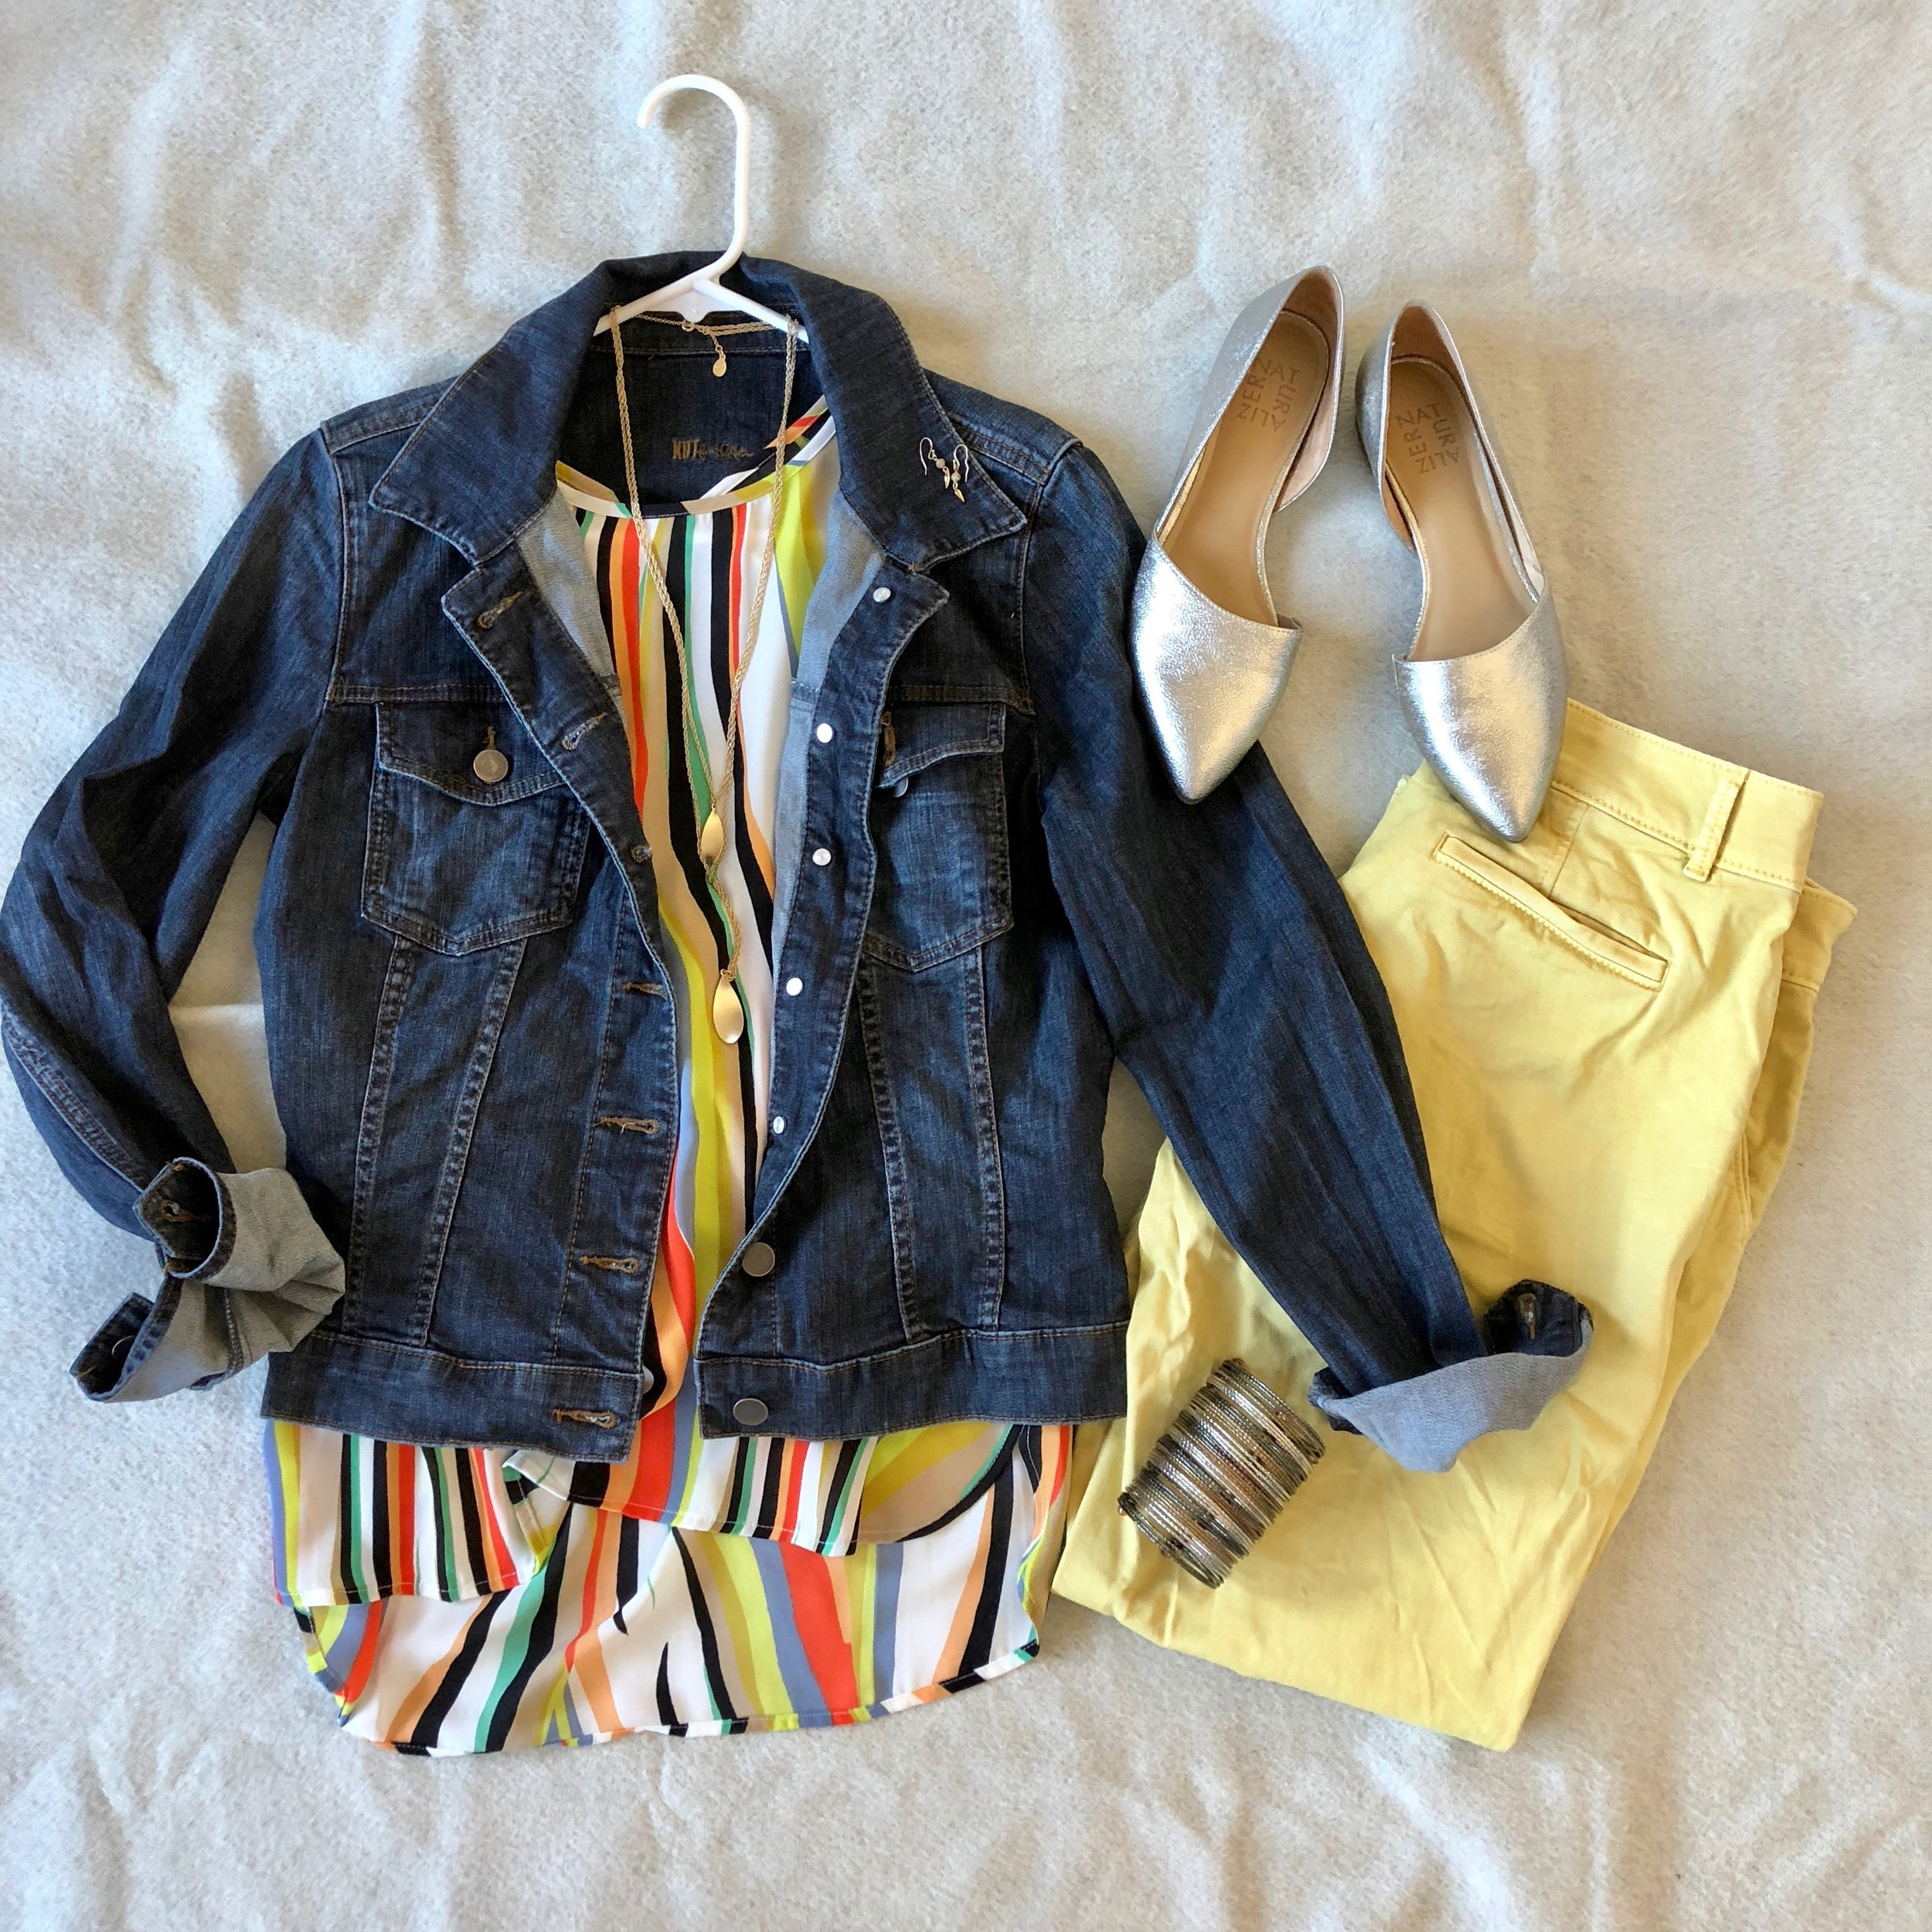 denim jacket and chinos.jpg